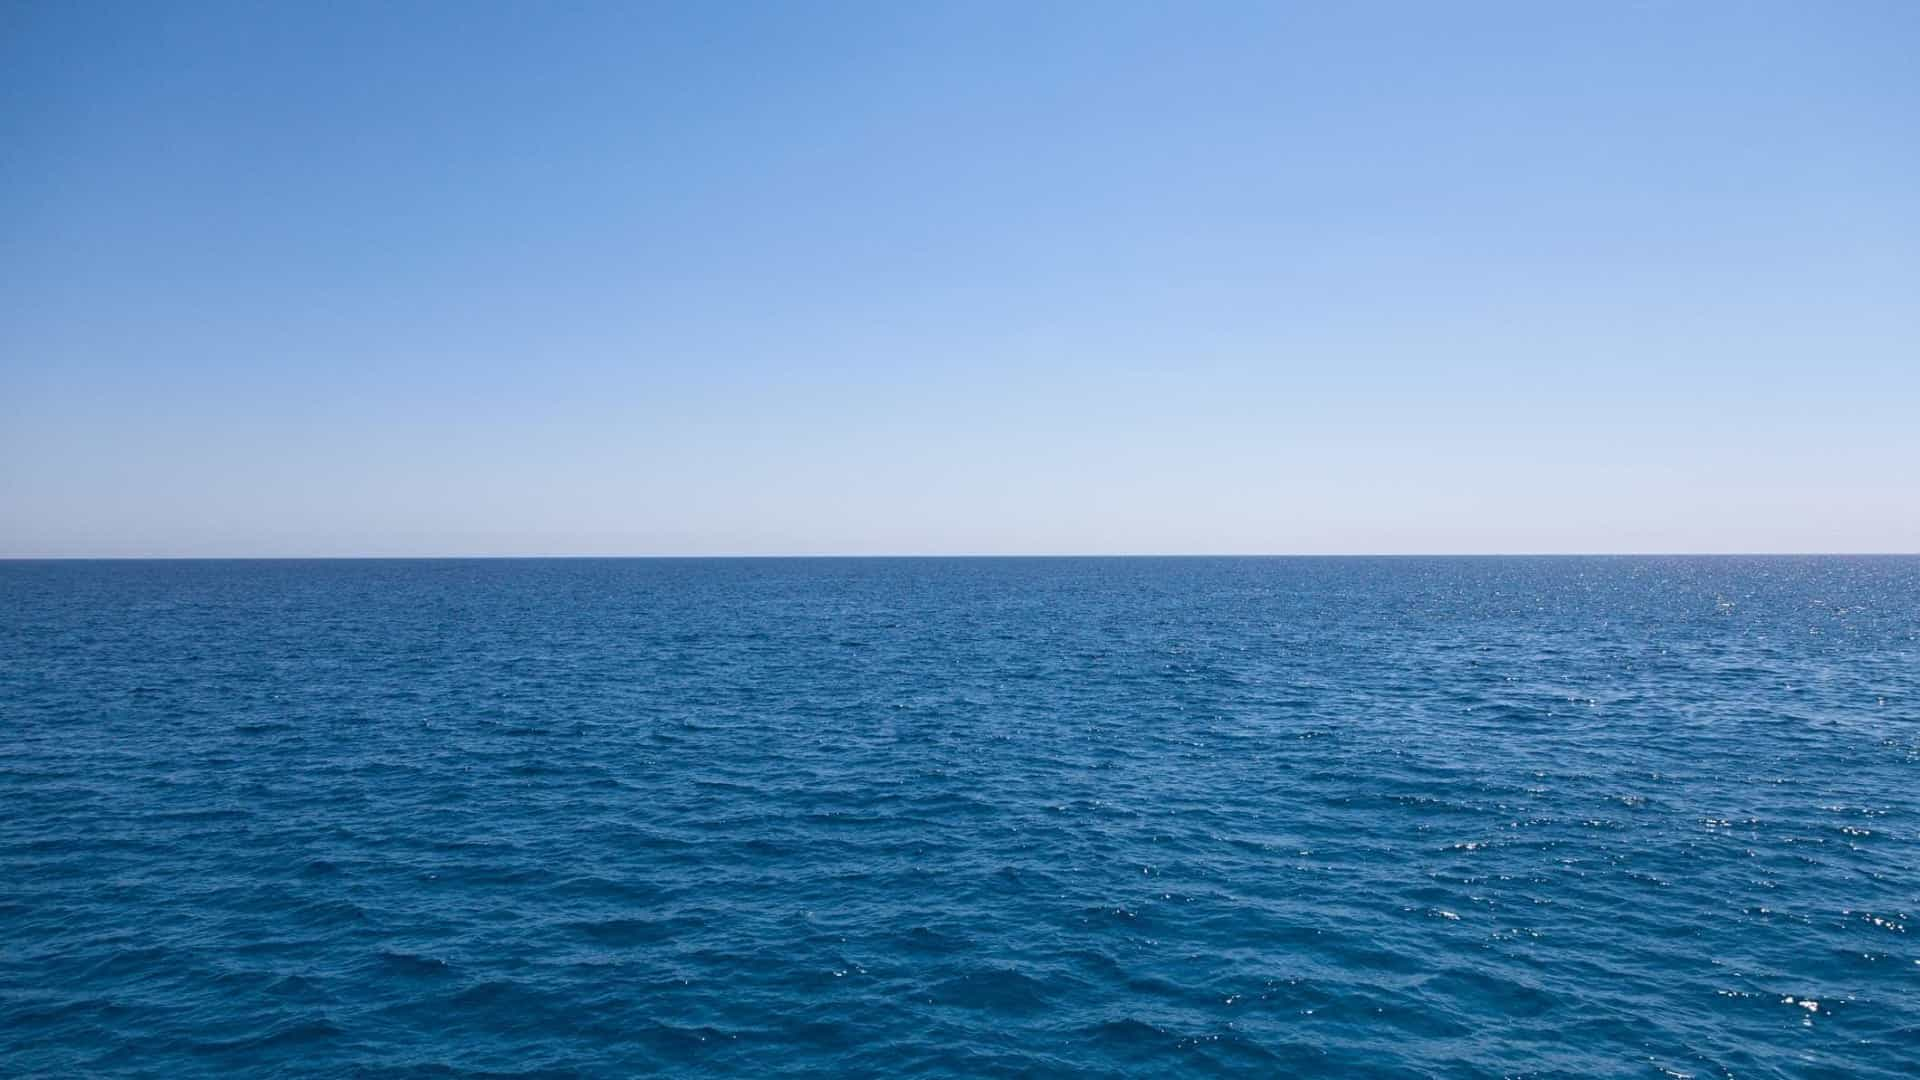 Porque E Que A Agua Do Mar E Azul E Nao Transparente